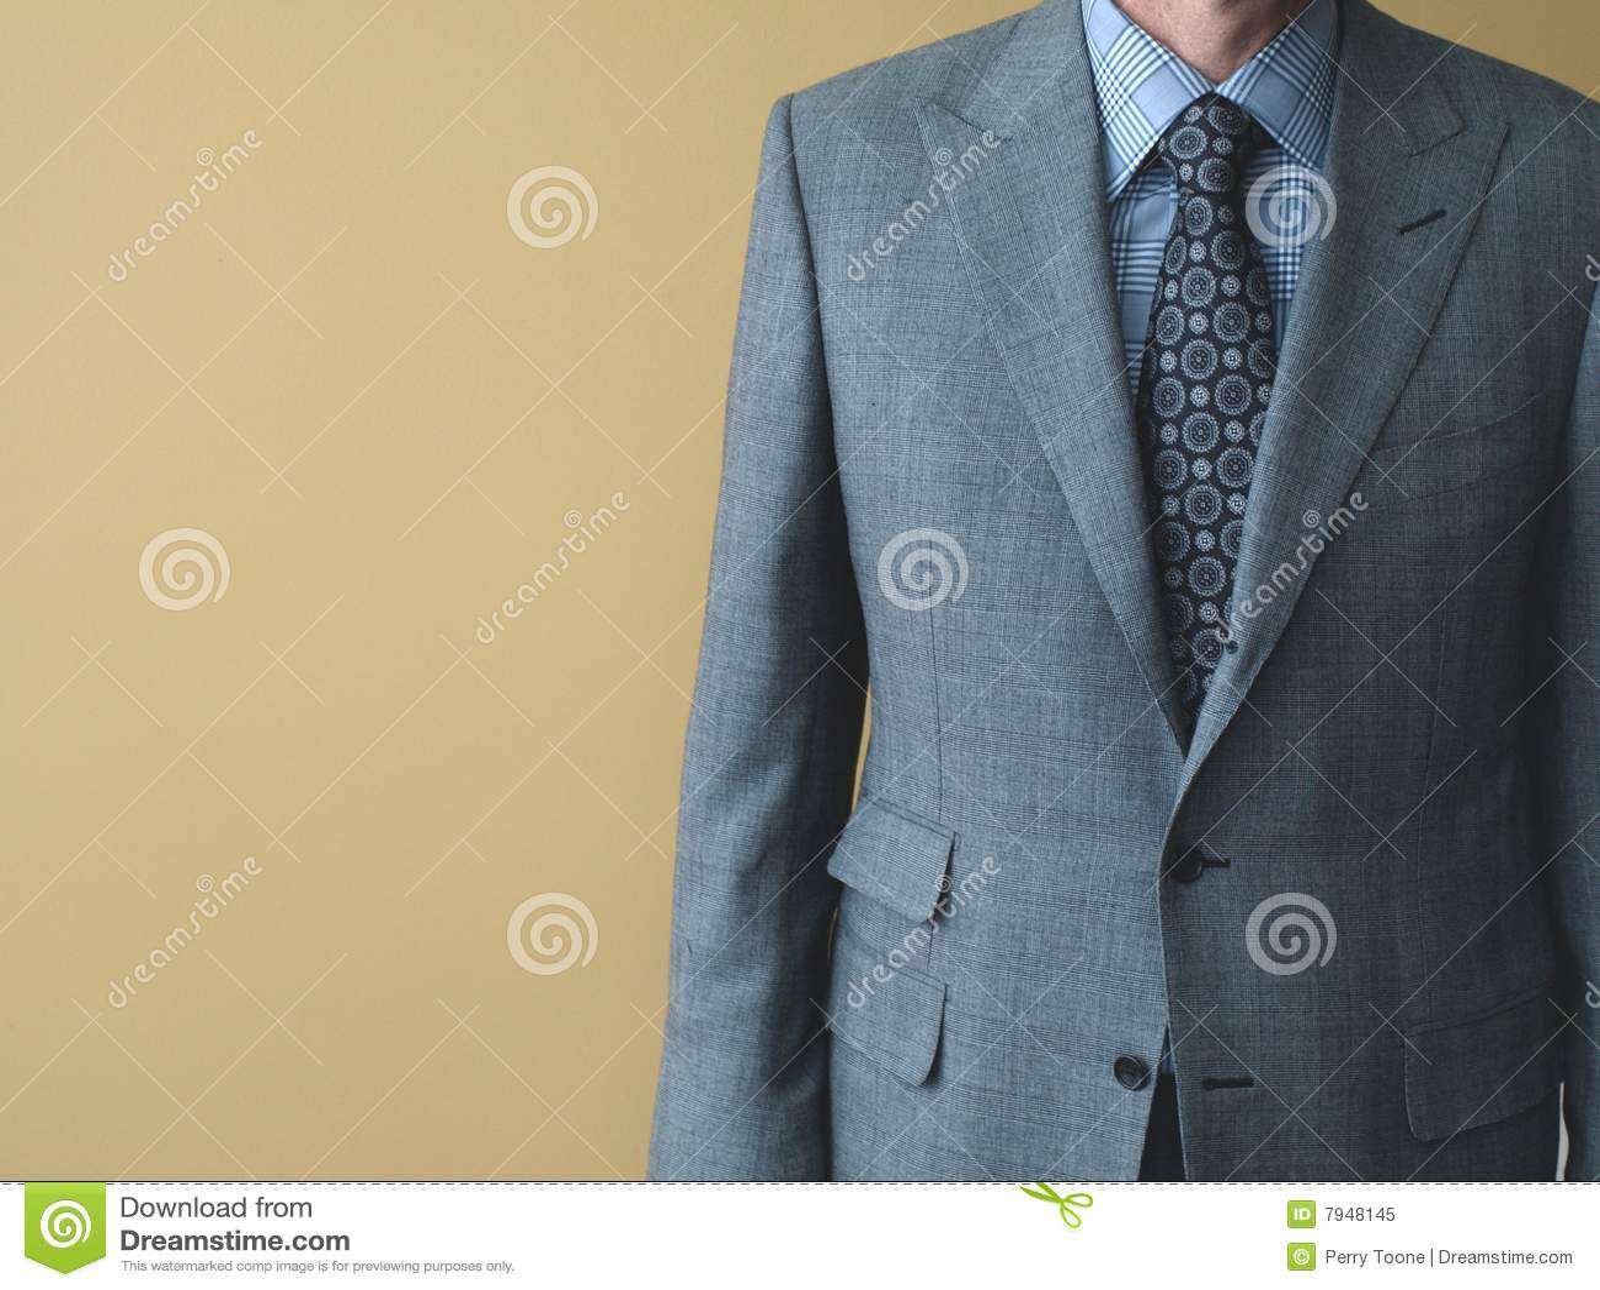 anonymous man suit - photo #24